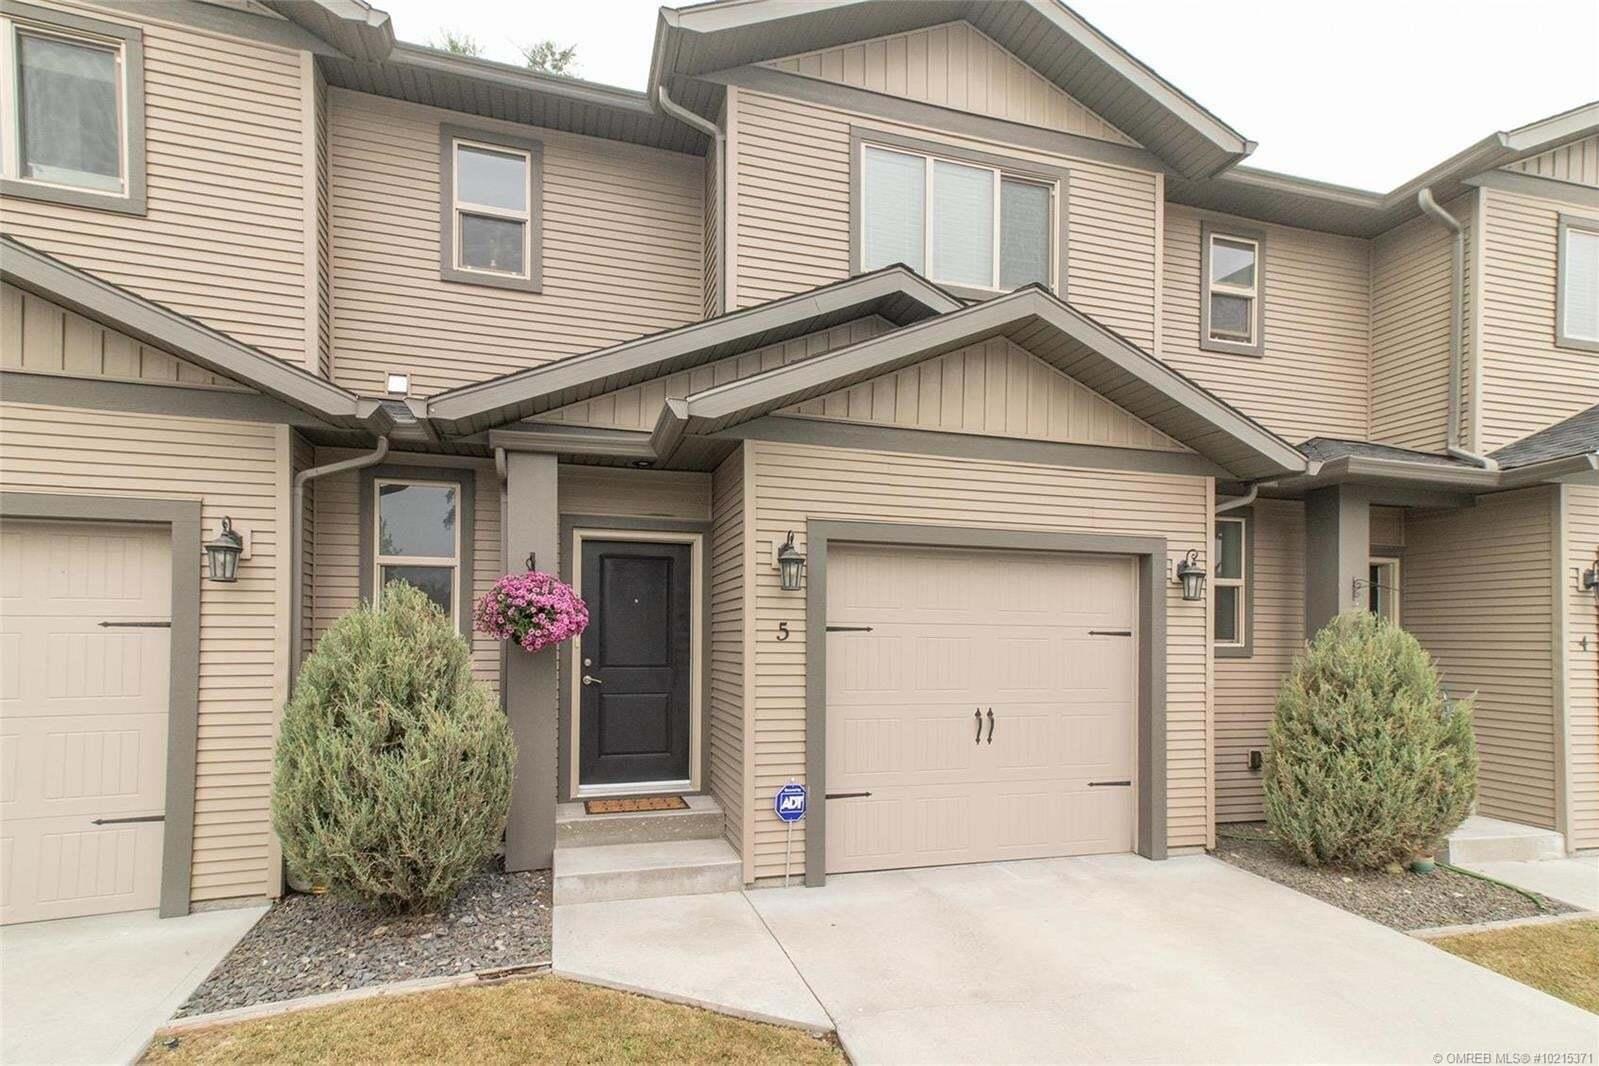 Townhouse for sale at 320 Nickel Rd Unit 5 Kelowna British Columbia - MLS: 10215371